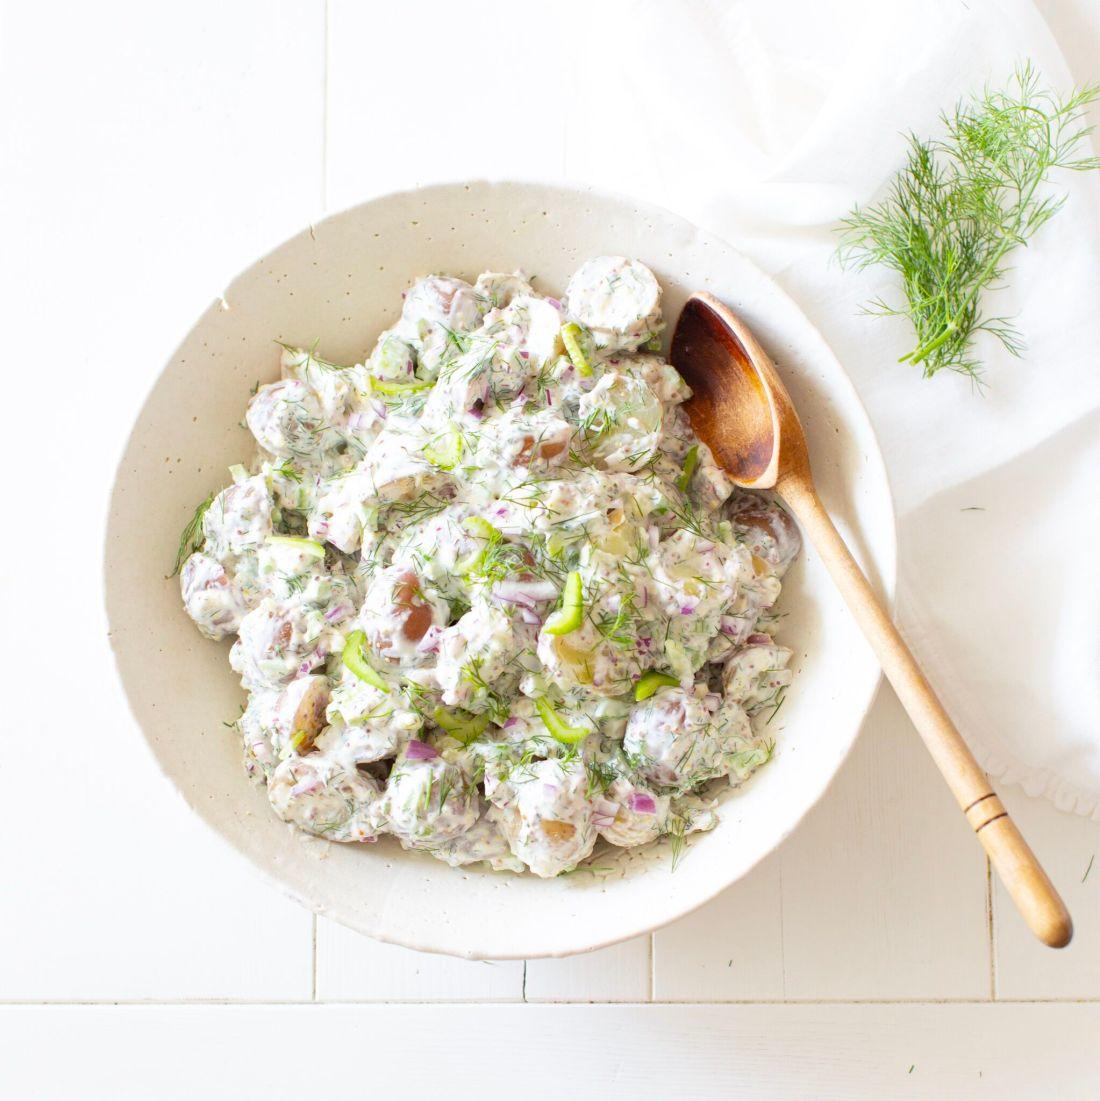 Creamy Potato Dill Salad made with Greek Yogurt